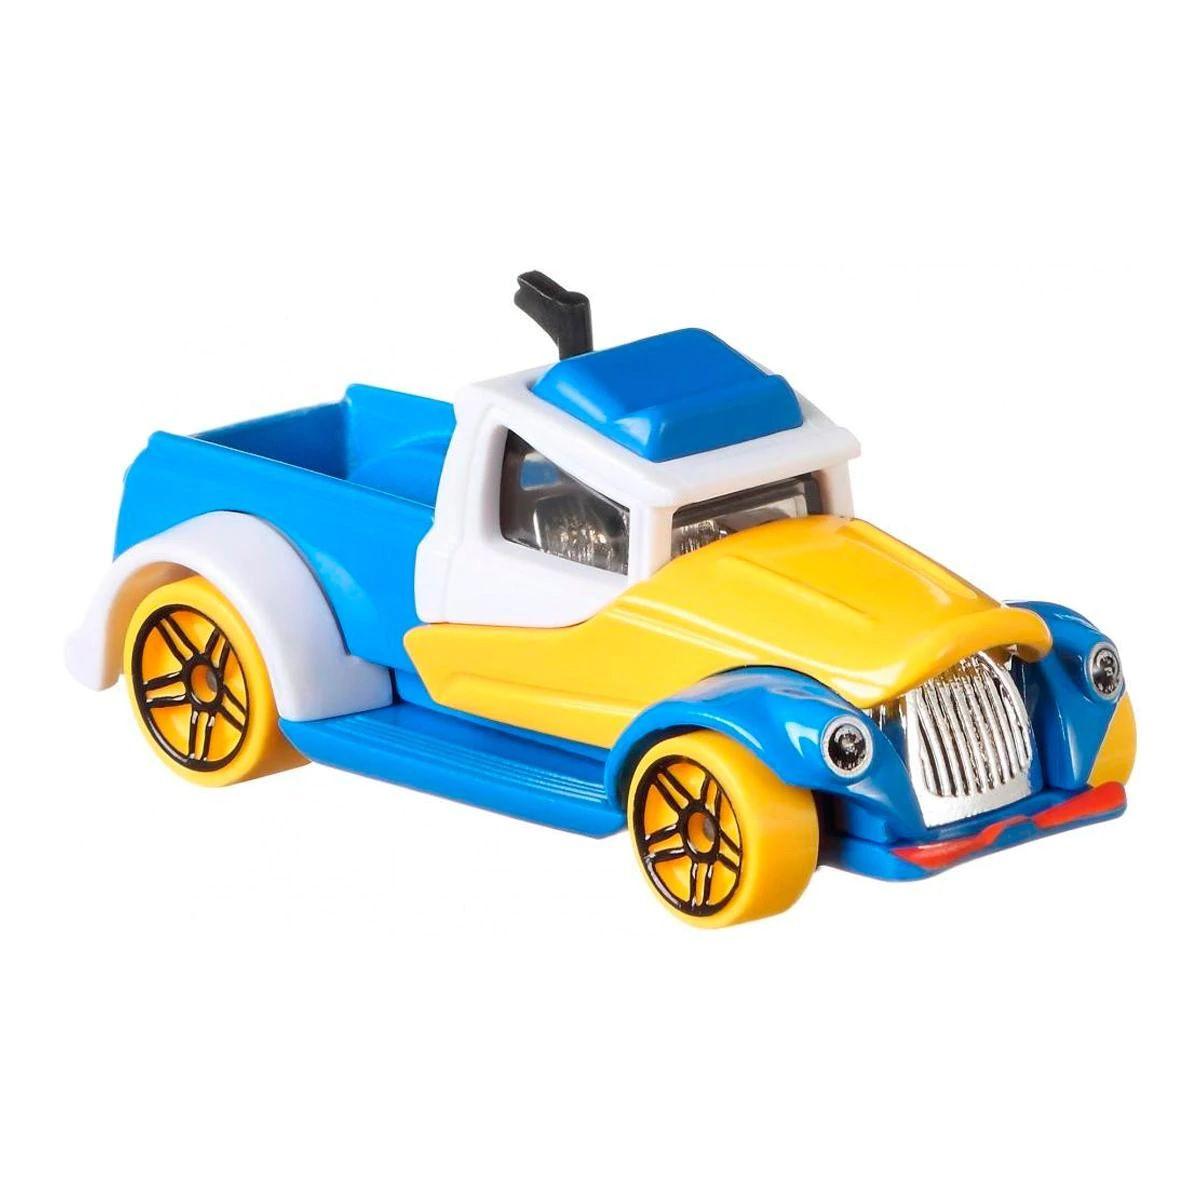 Carrinho Hot Wheels Pato Donald: Disney (Series 4) - Mattel